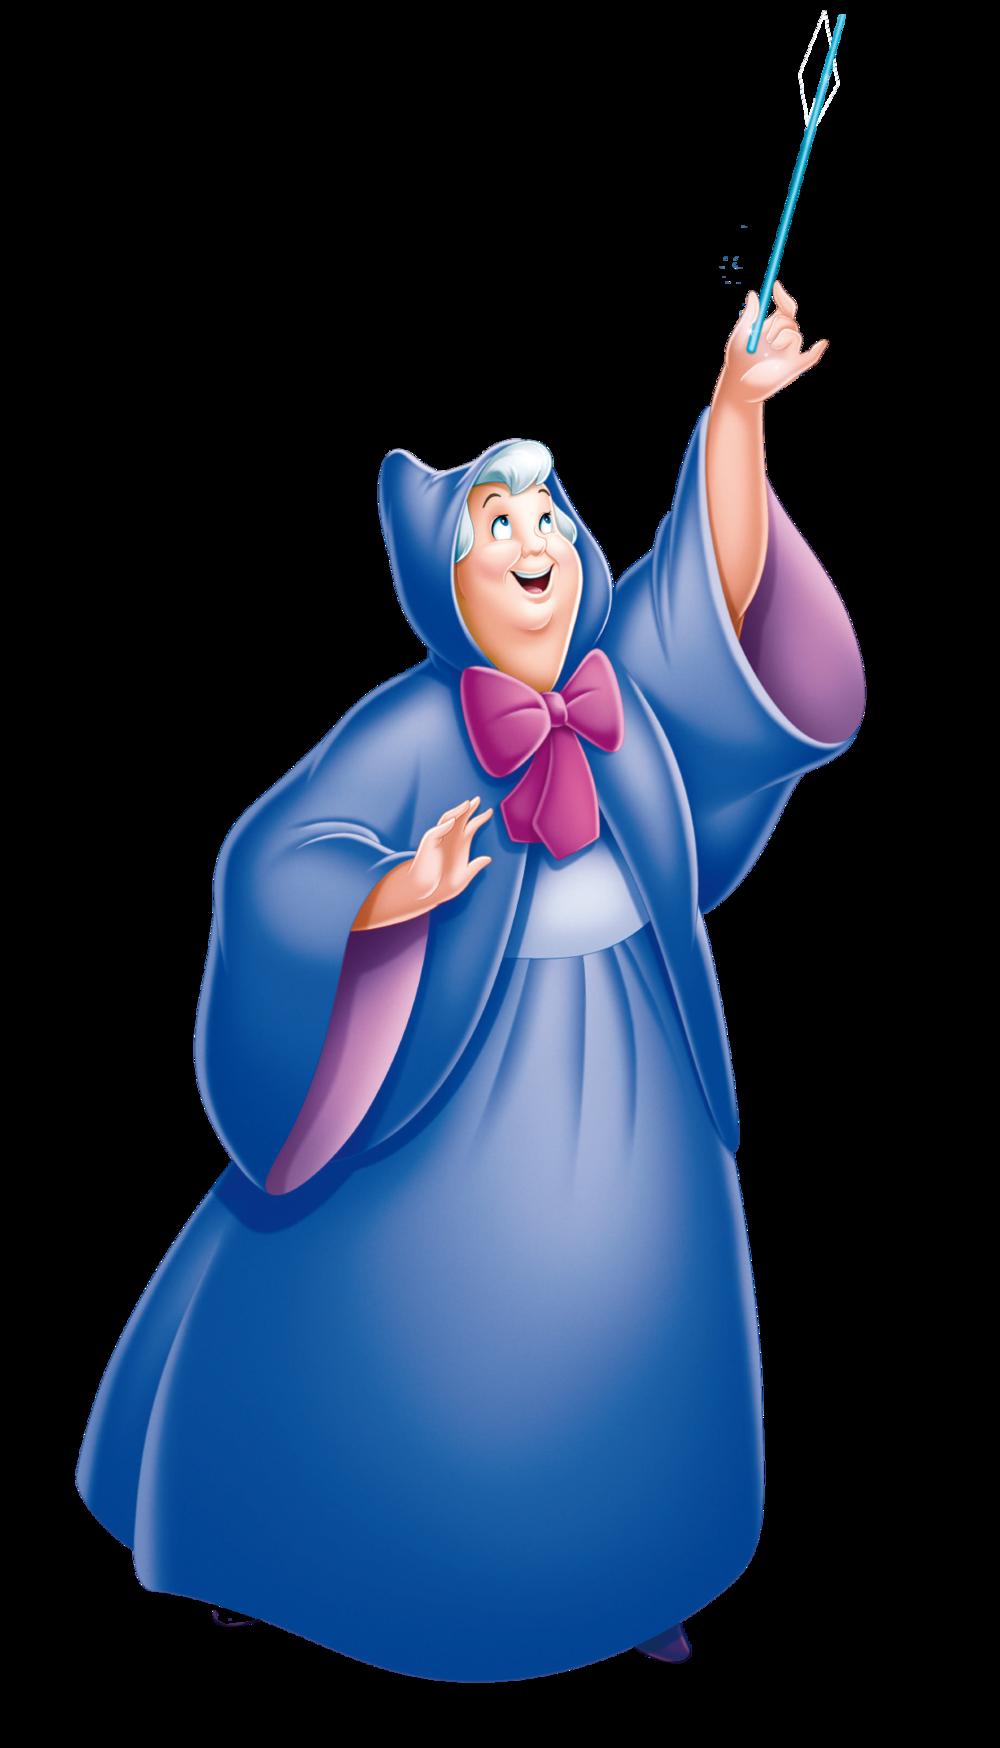 Fairy Godmother Gallery Cinderella Fairy Godmother Fairy Godmother Costume Cinderella Fairy Godmother Costume